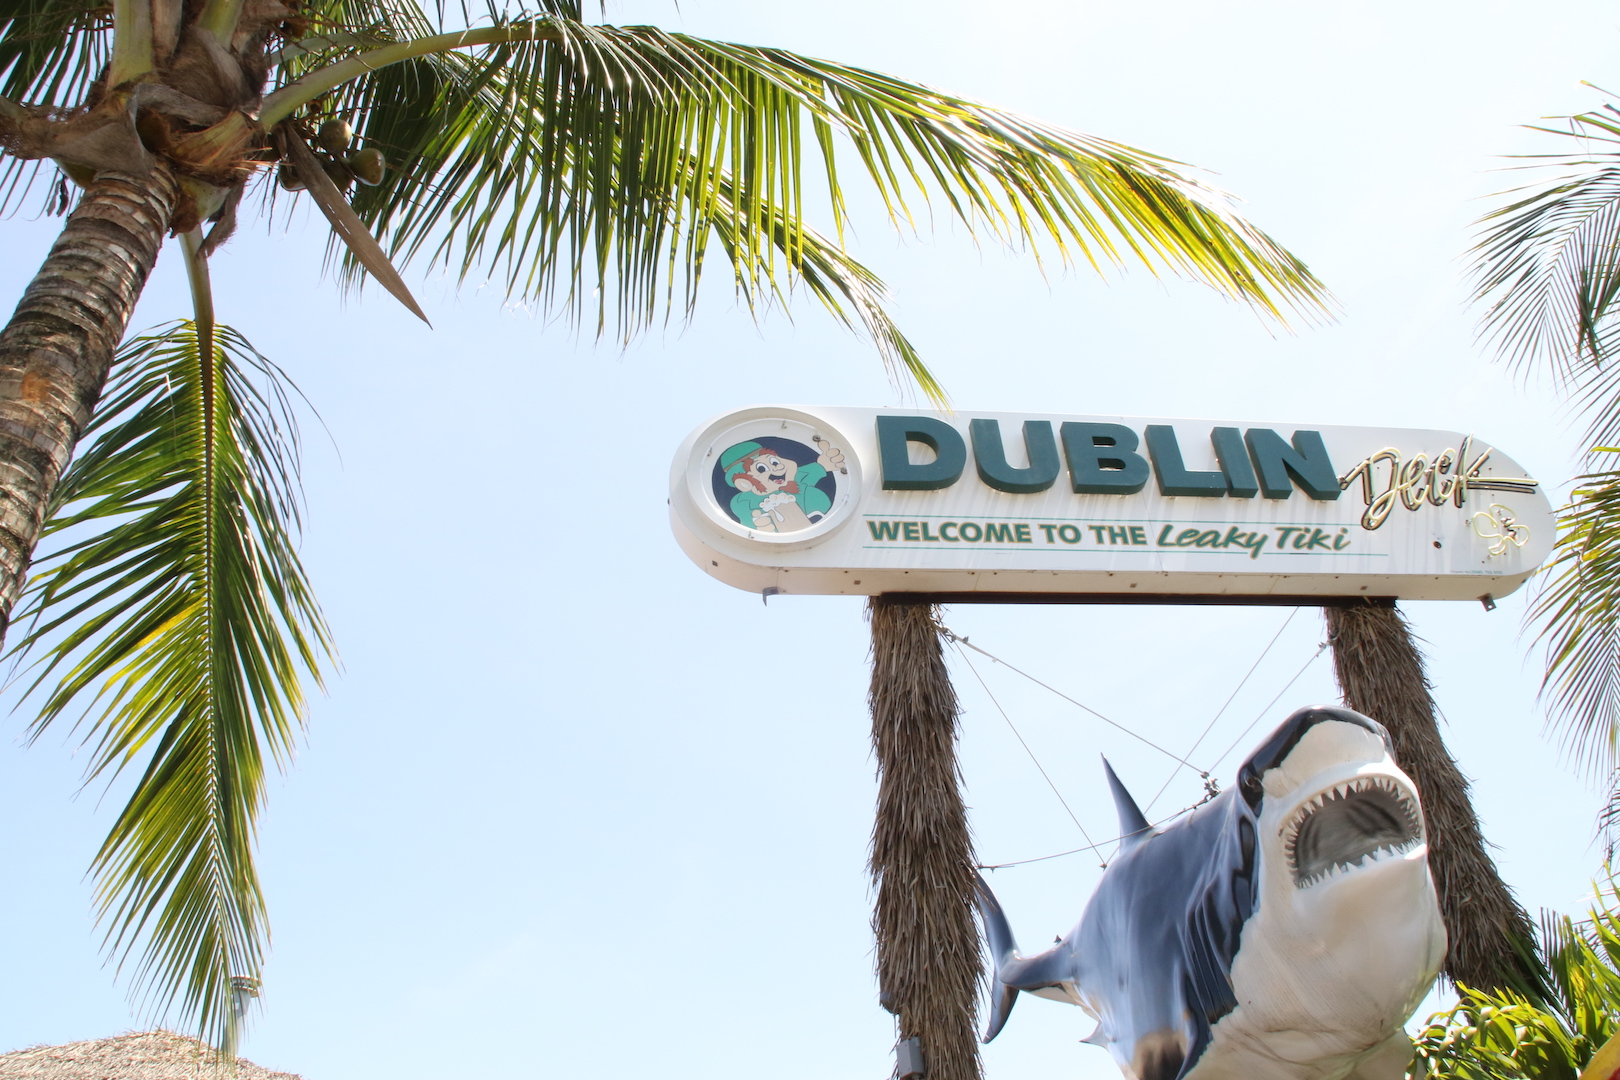 Dublin Deck